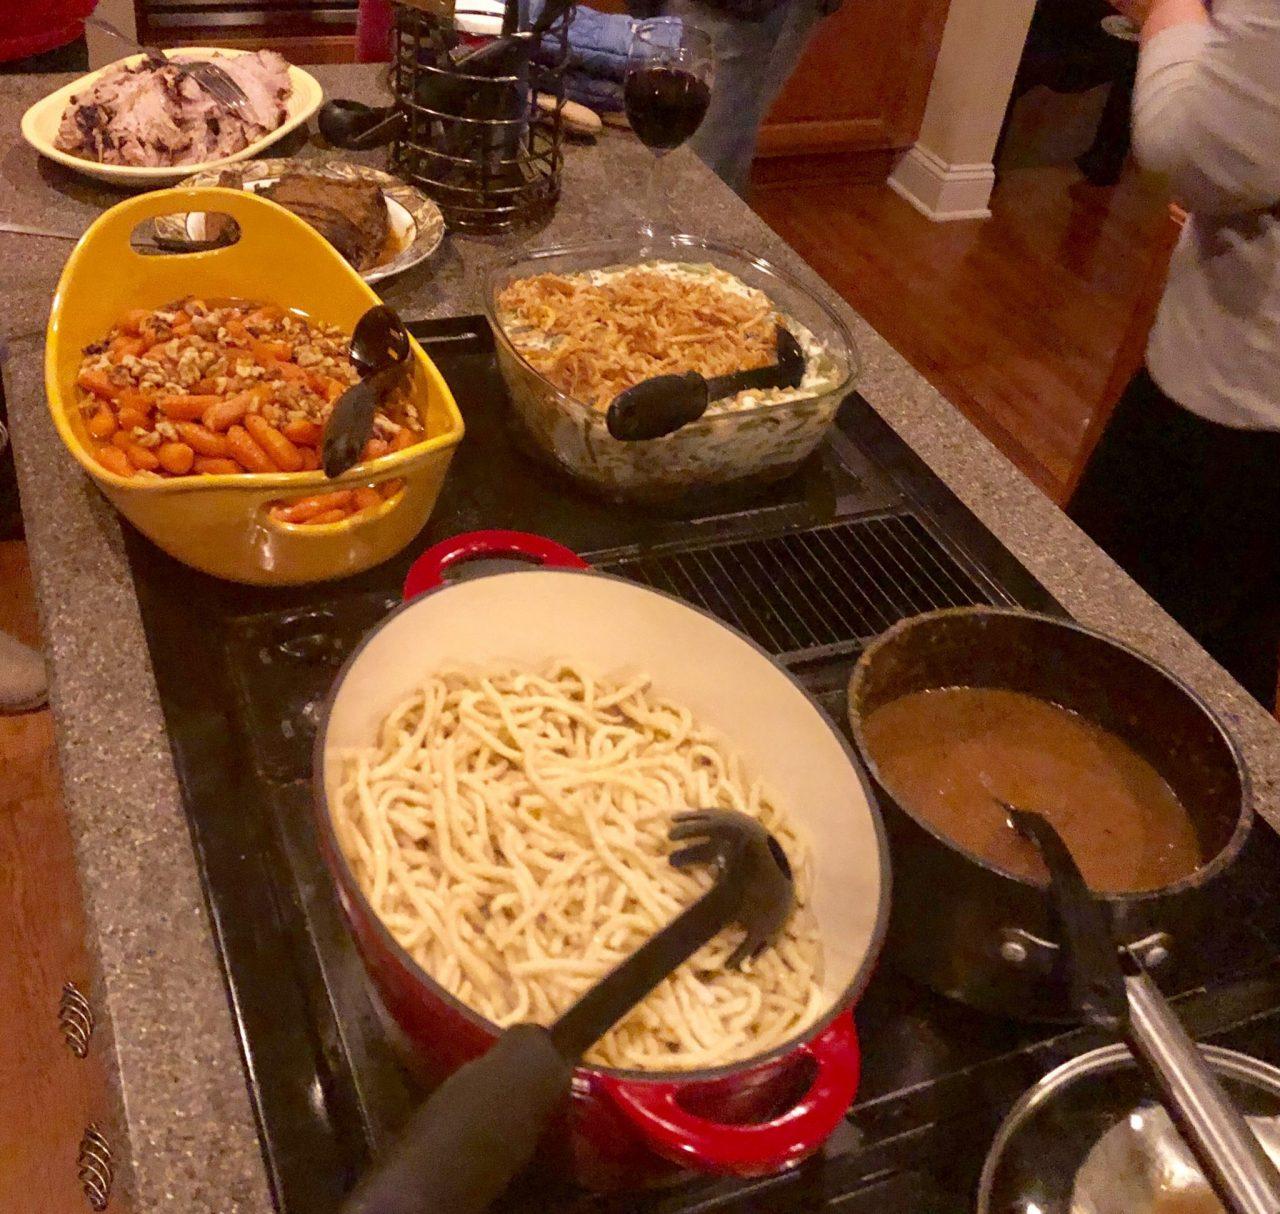 Dinner buffet, Glazed Carrots with Walnuts